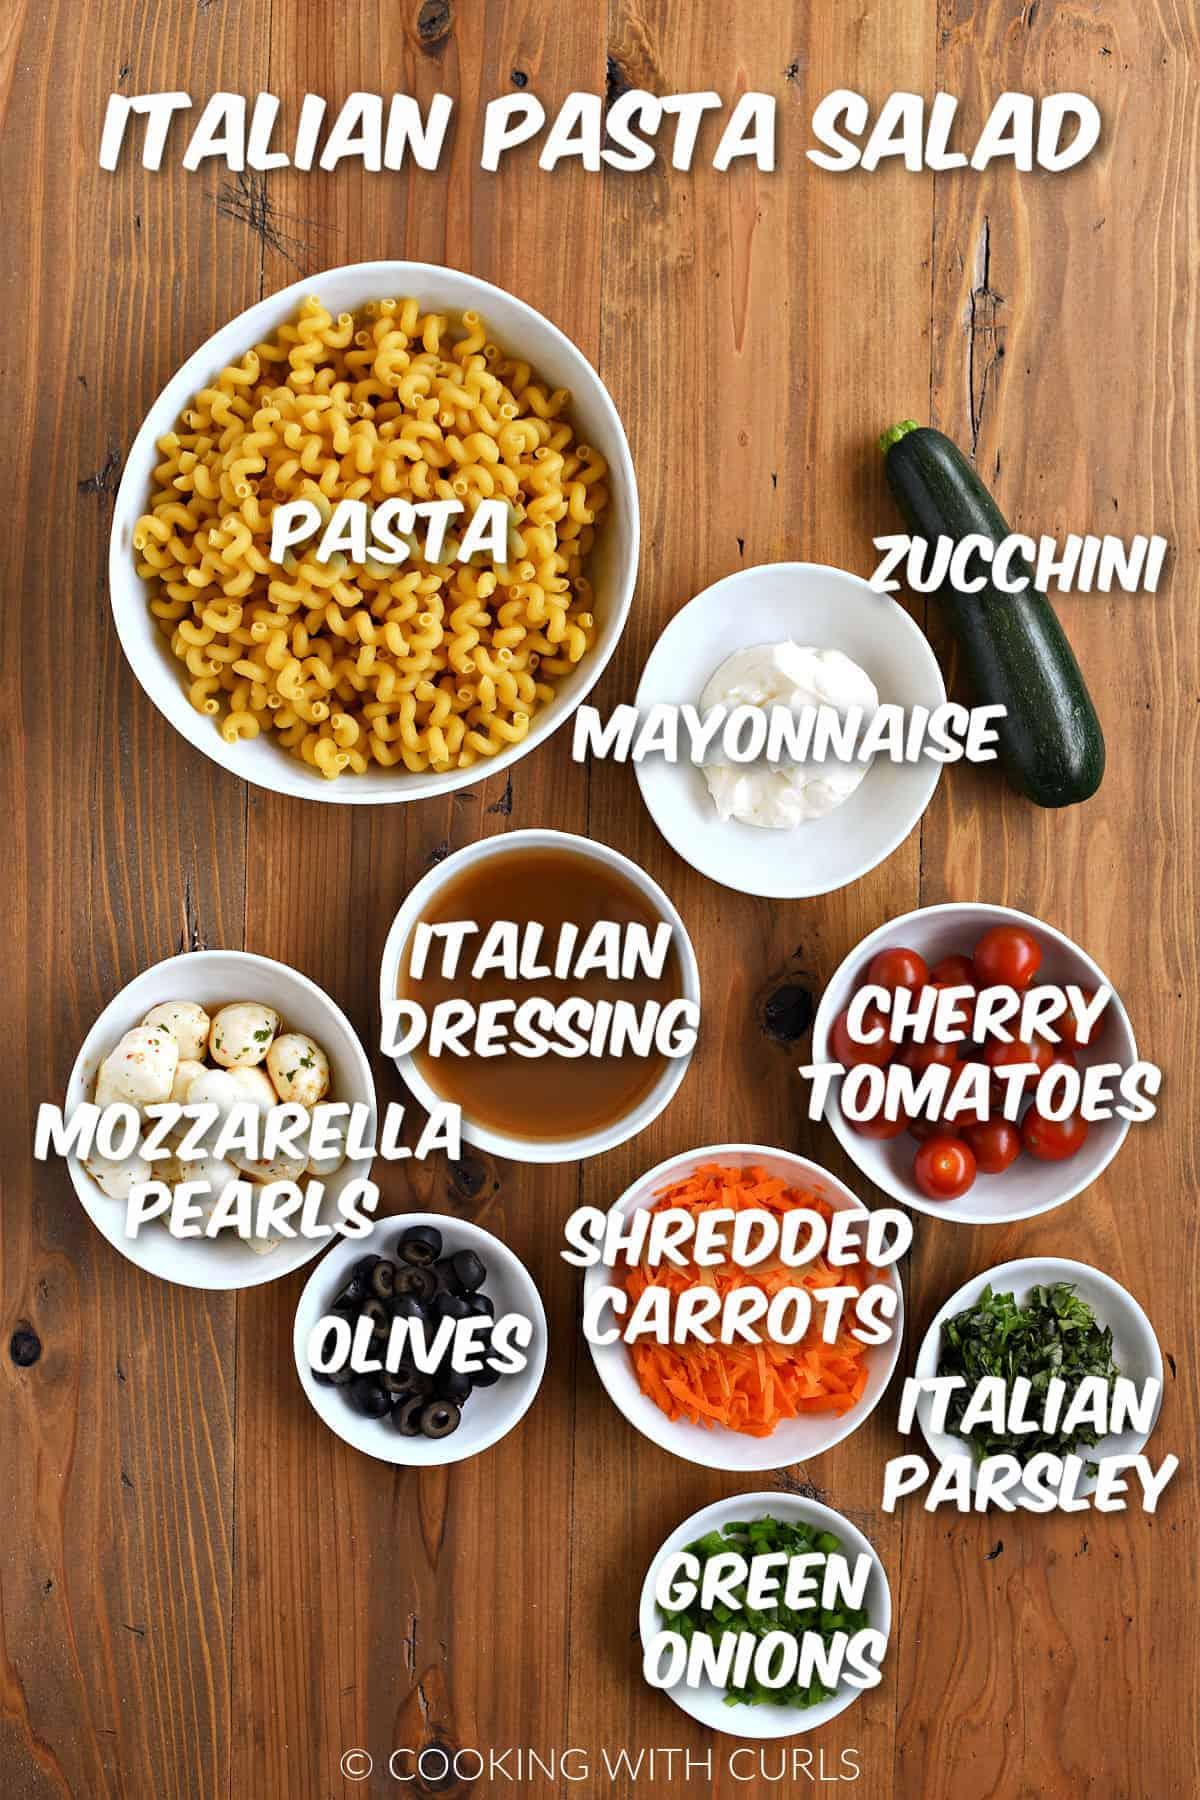 Italian Pasta Salad ingredients in white bowls.